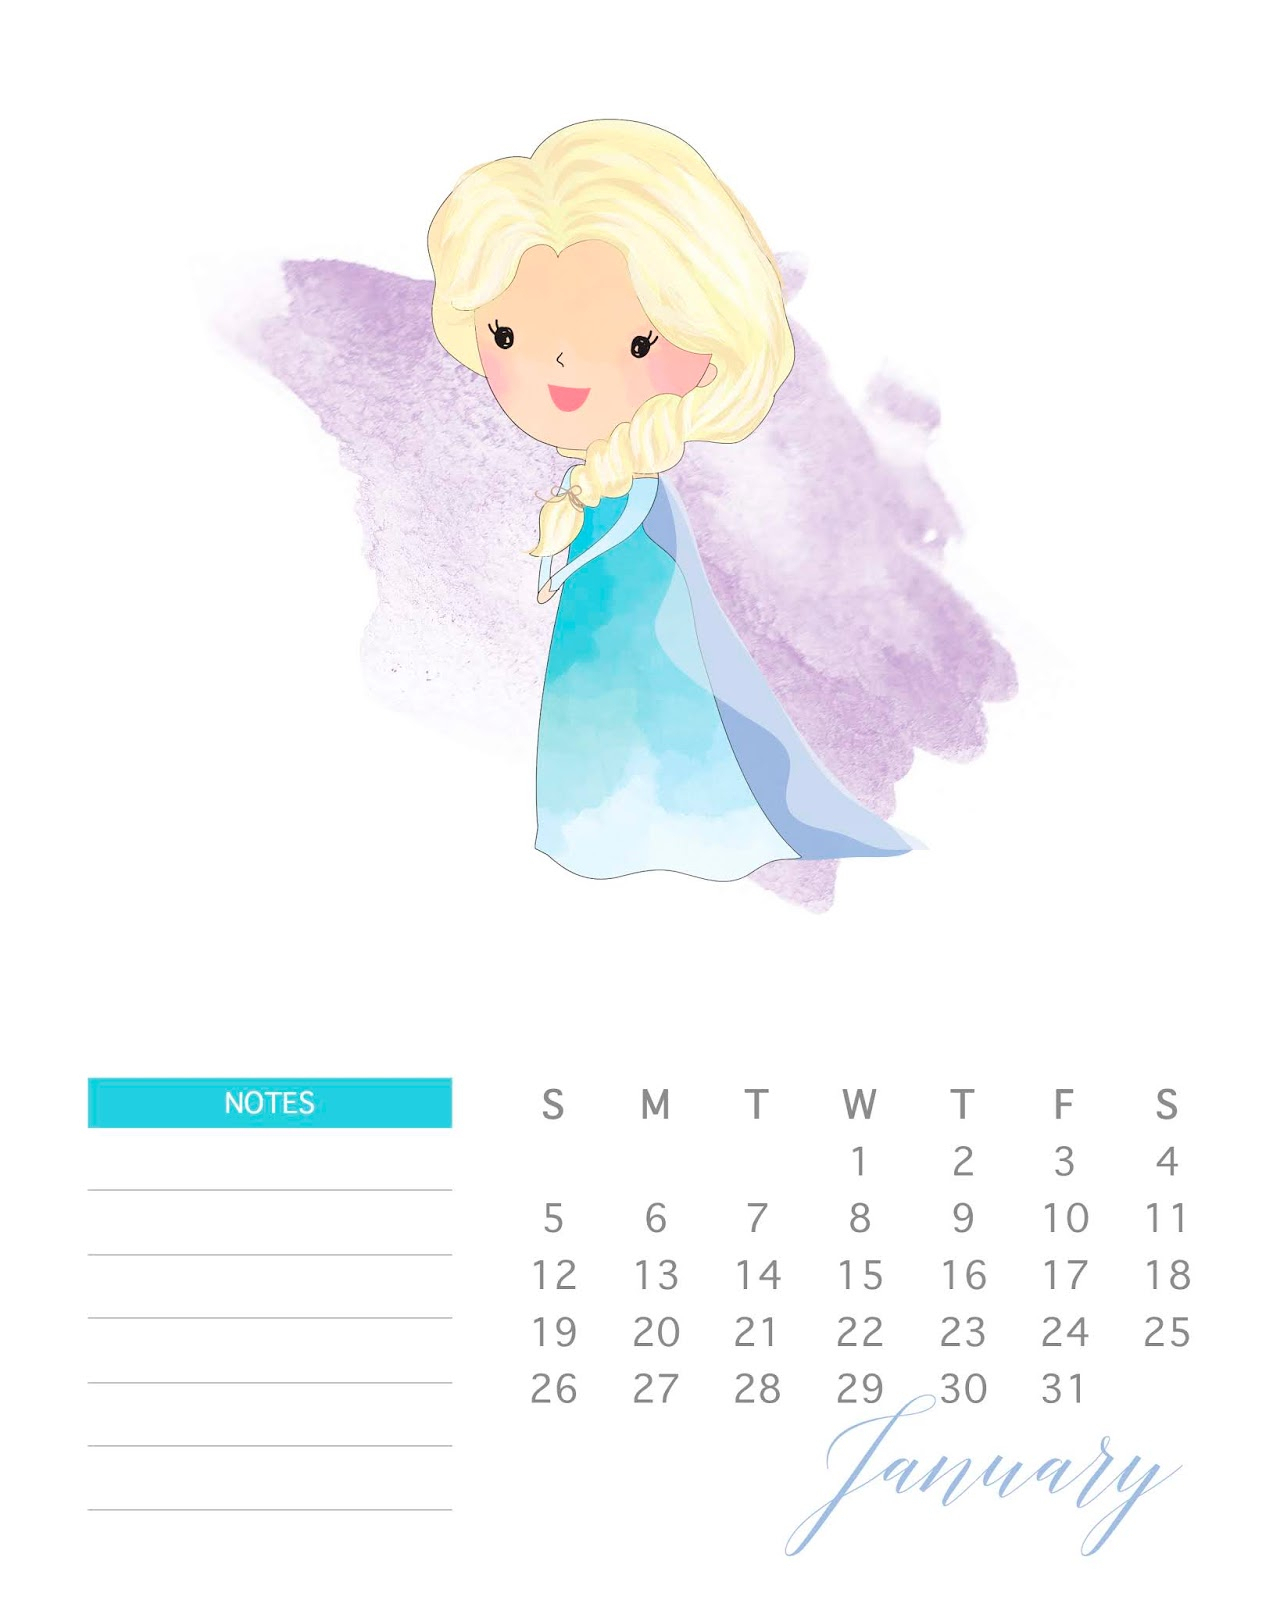 August 2020 Printable Calender Disney Princess | Example